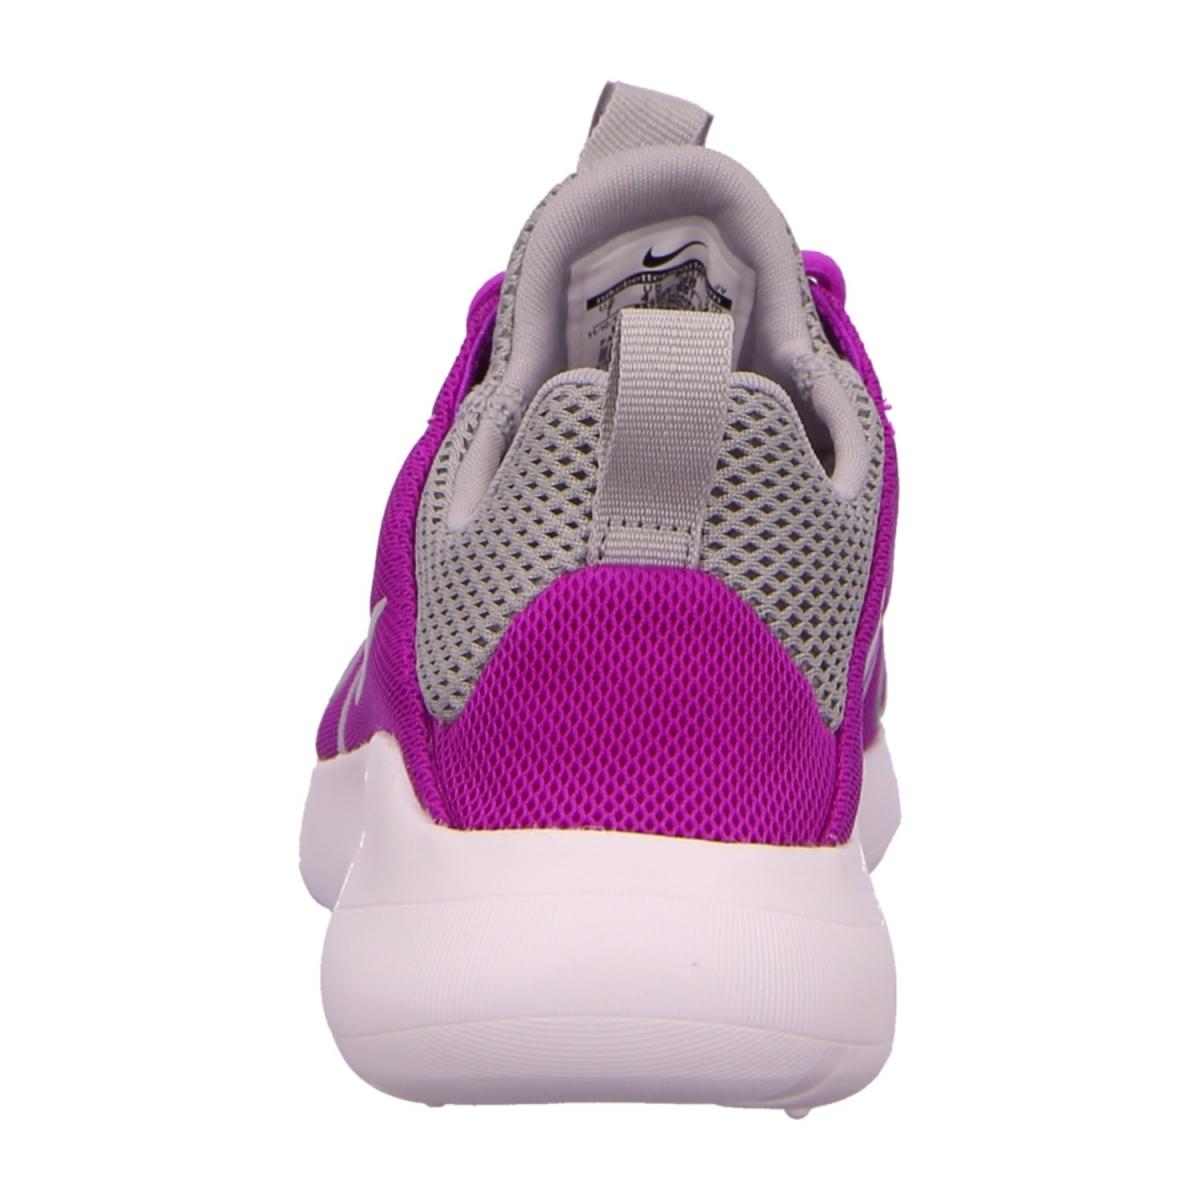 tom hanks en streaming - Nike Kaishi 2.0 Sneaker pink - SALE Schuhfachmann